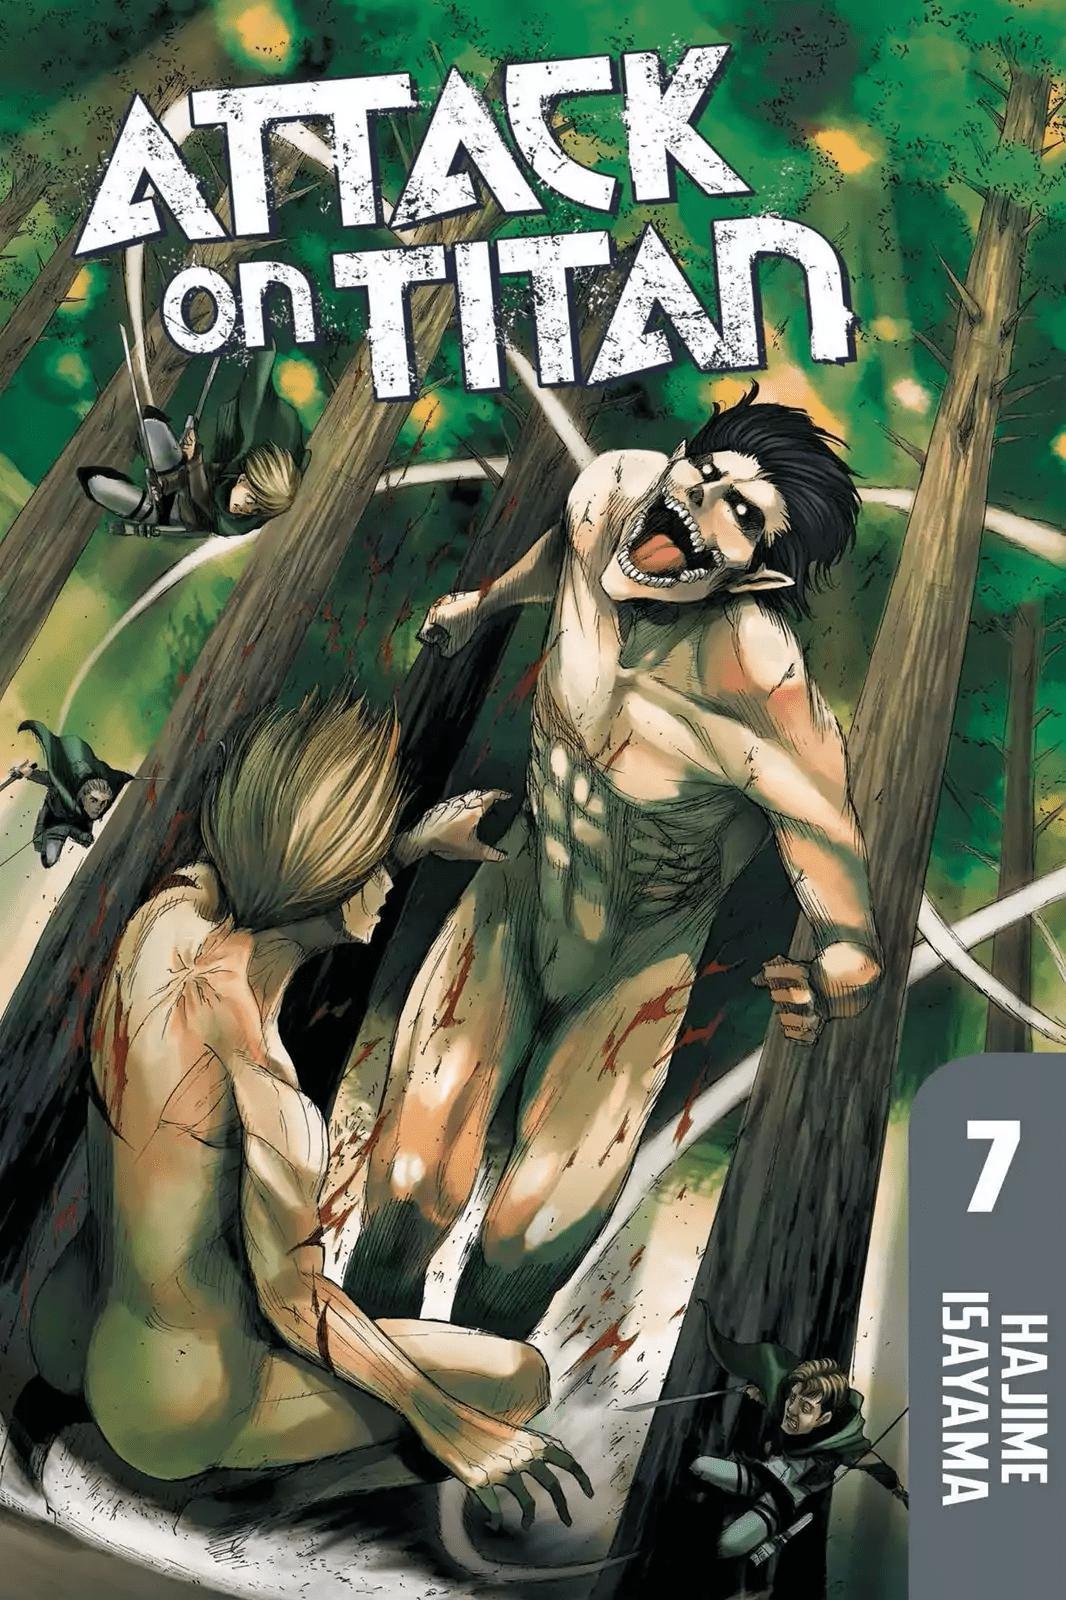 attack on titan season 1 torrent